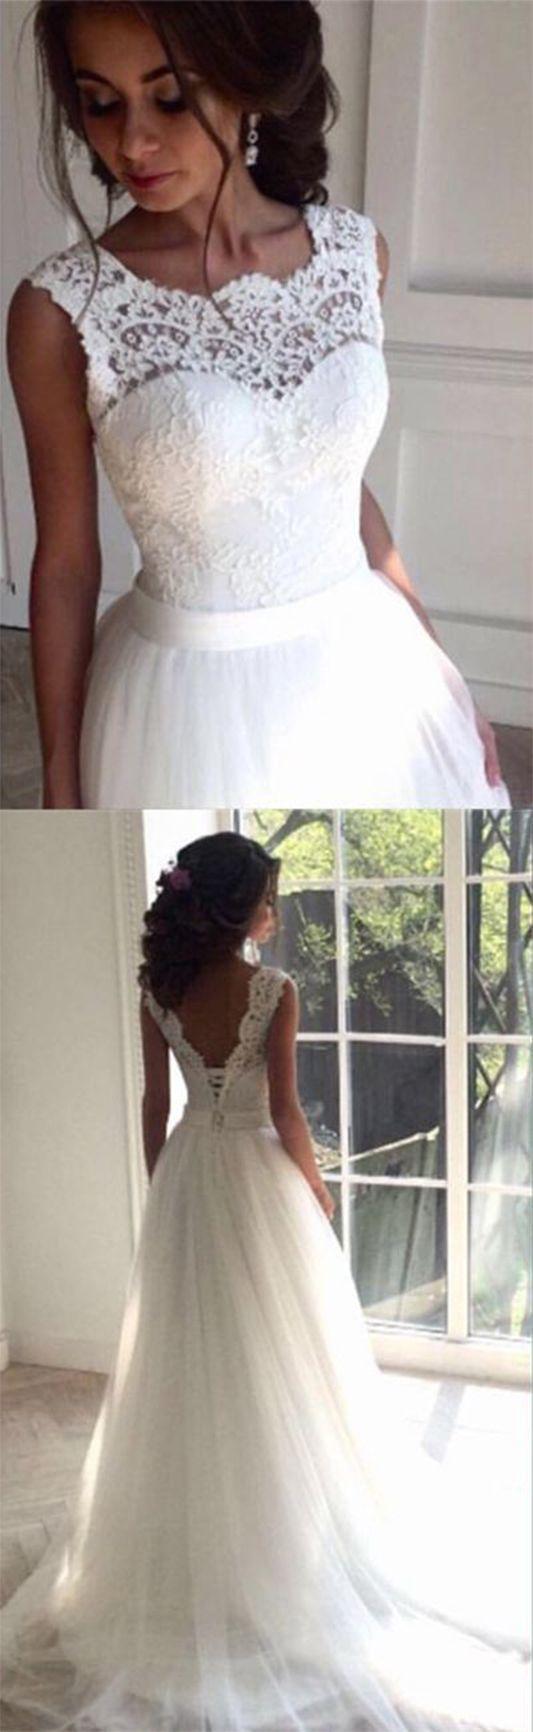 white lace wedding dress simple white wedding dresses Simple Wedding Dress Charming wedding dress lace wedding dress Tulle White wedding dress